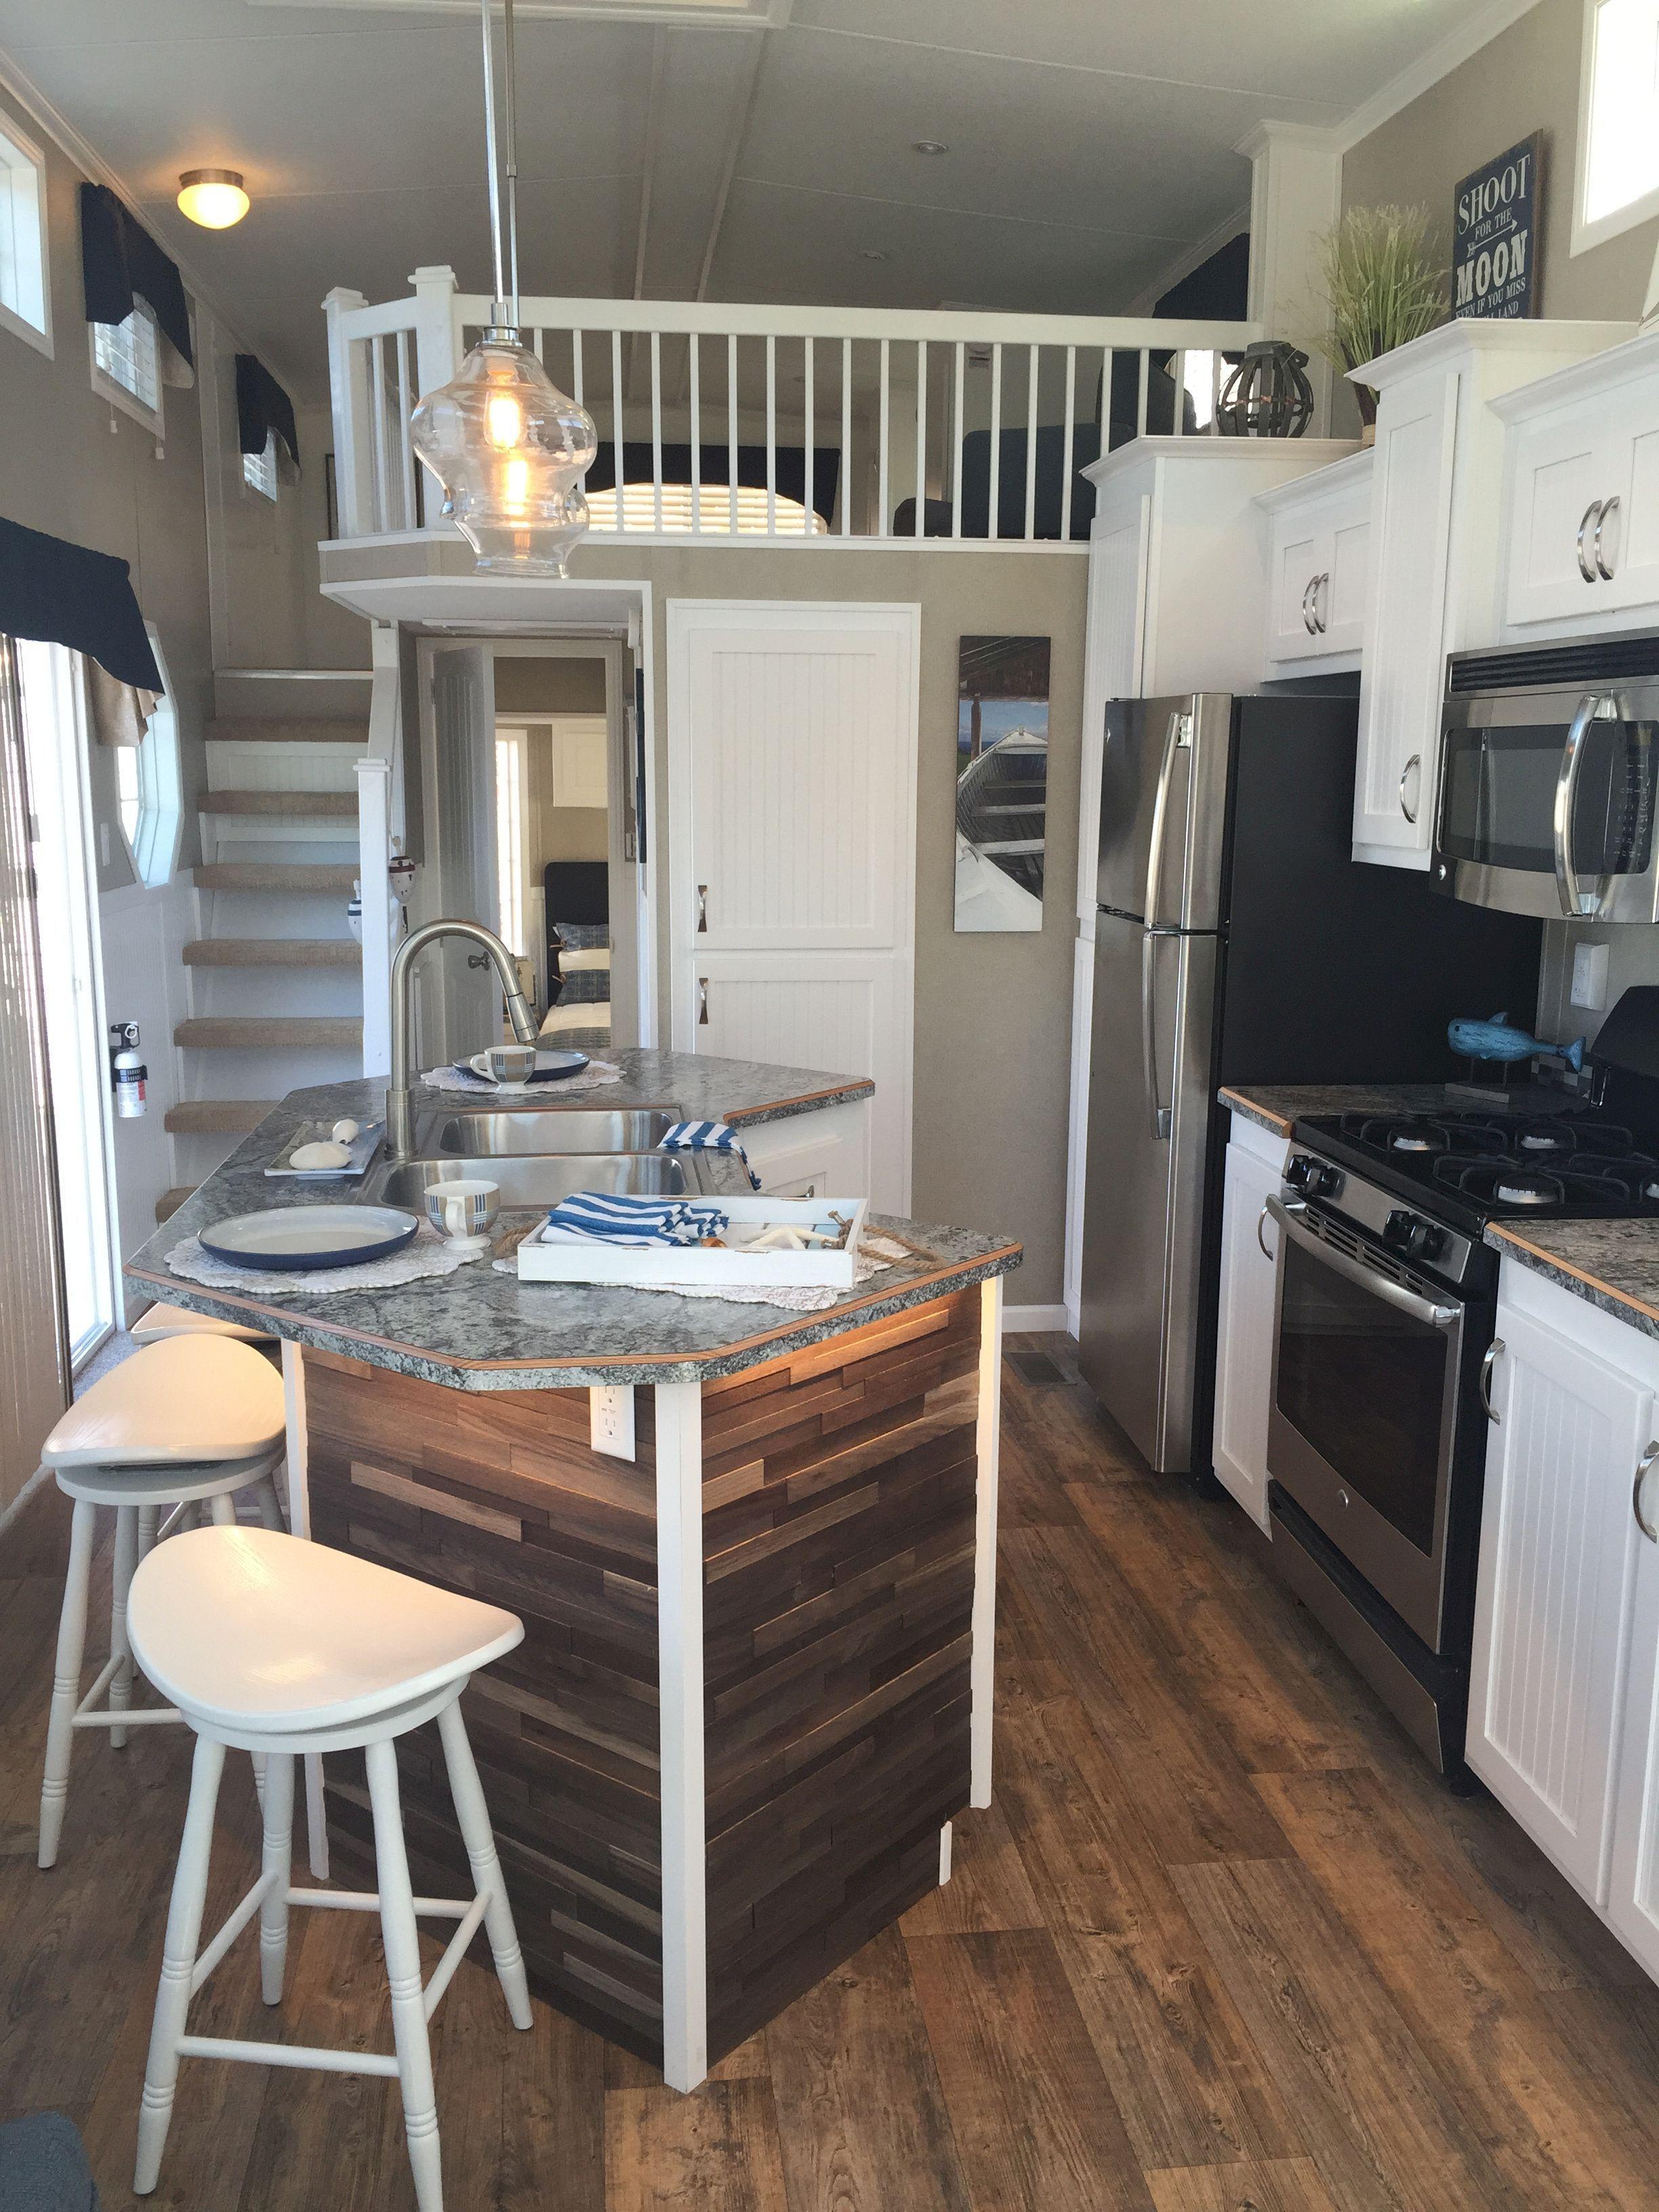 small kitchen design ideas living small 3 casas casas peque as rh pinterest cl